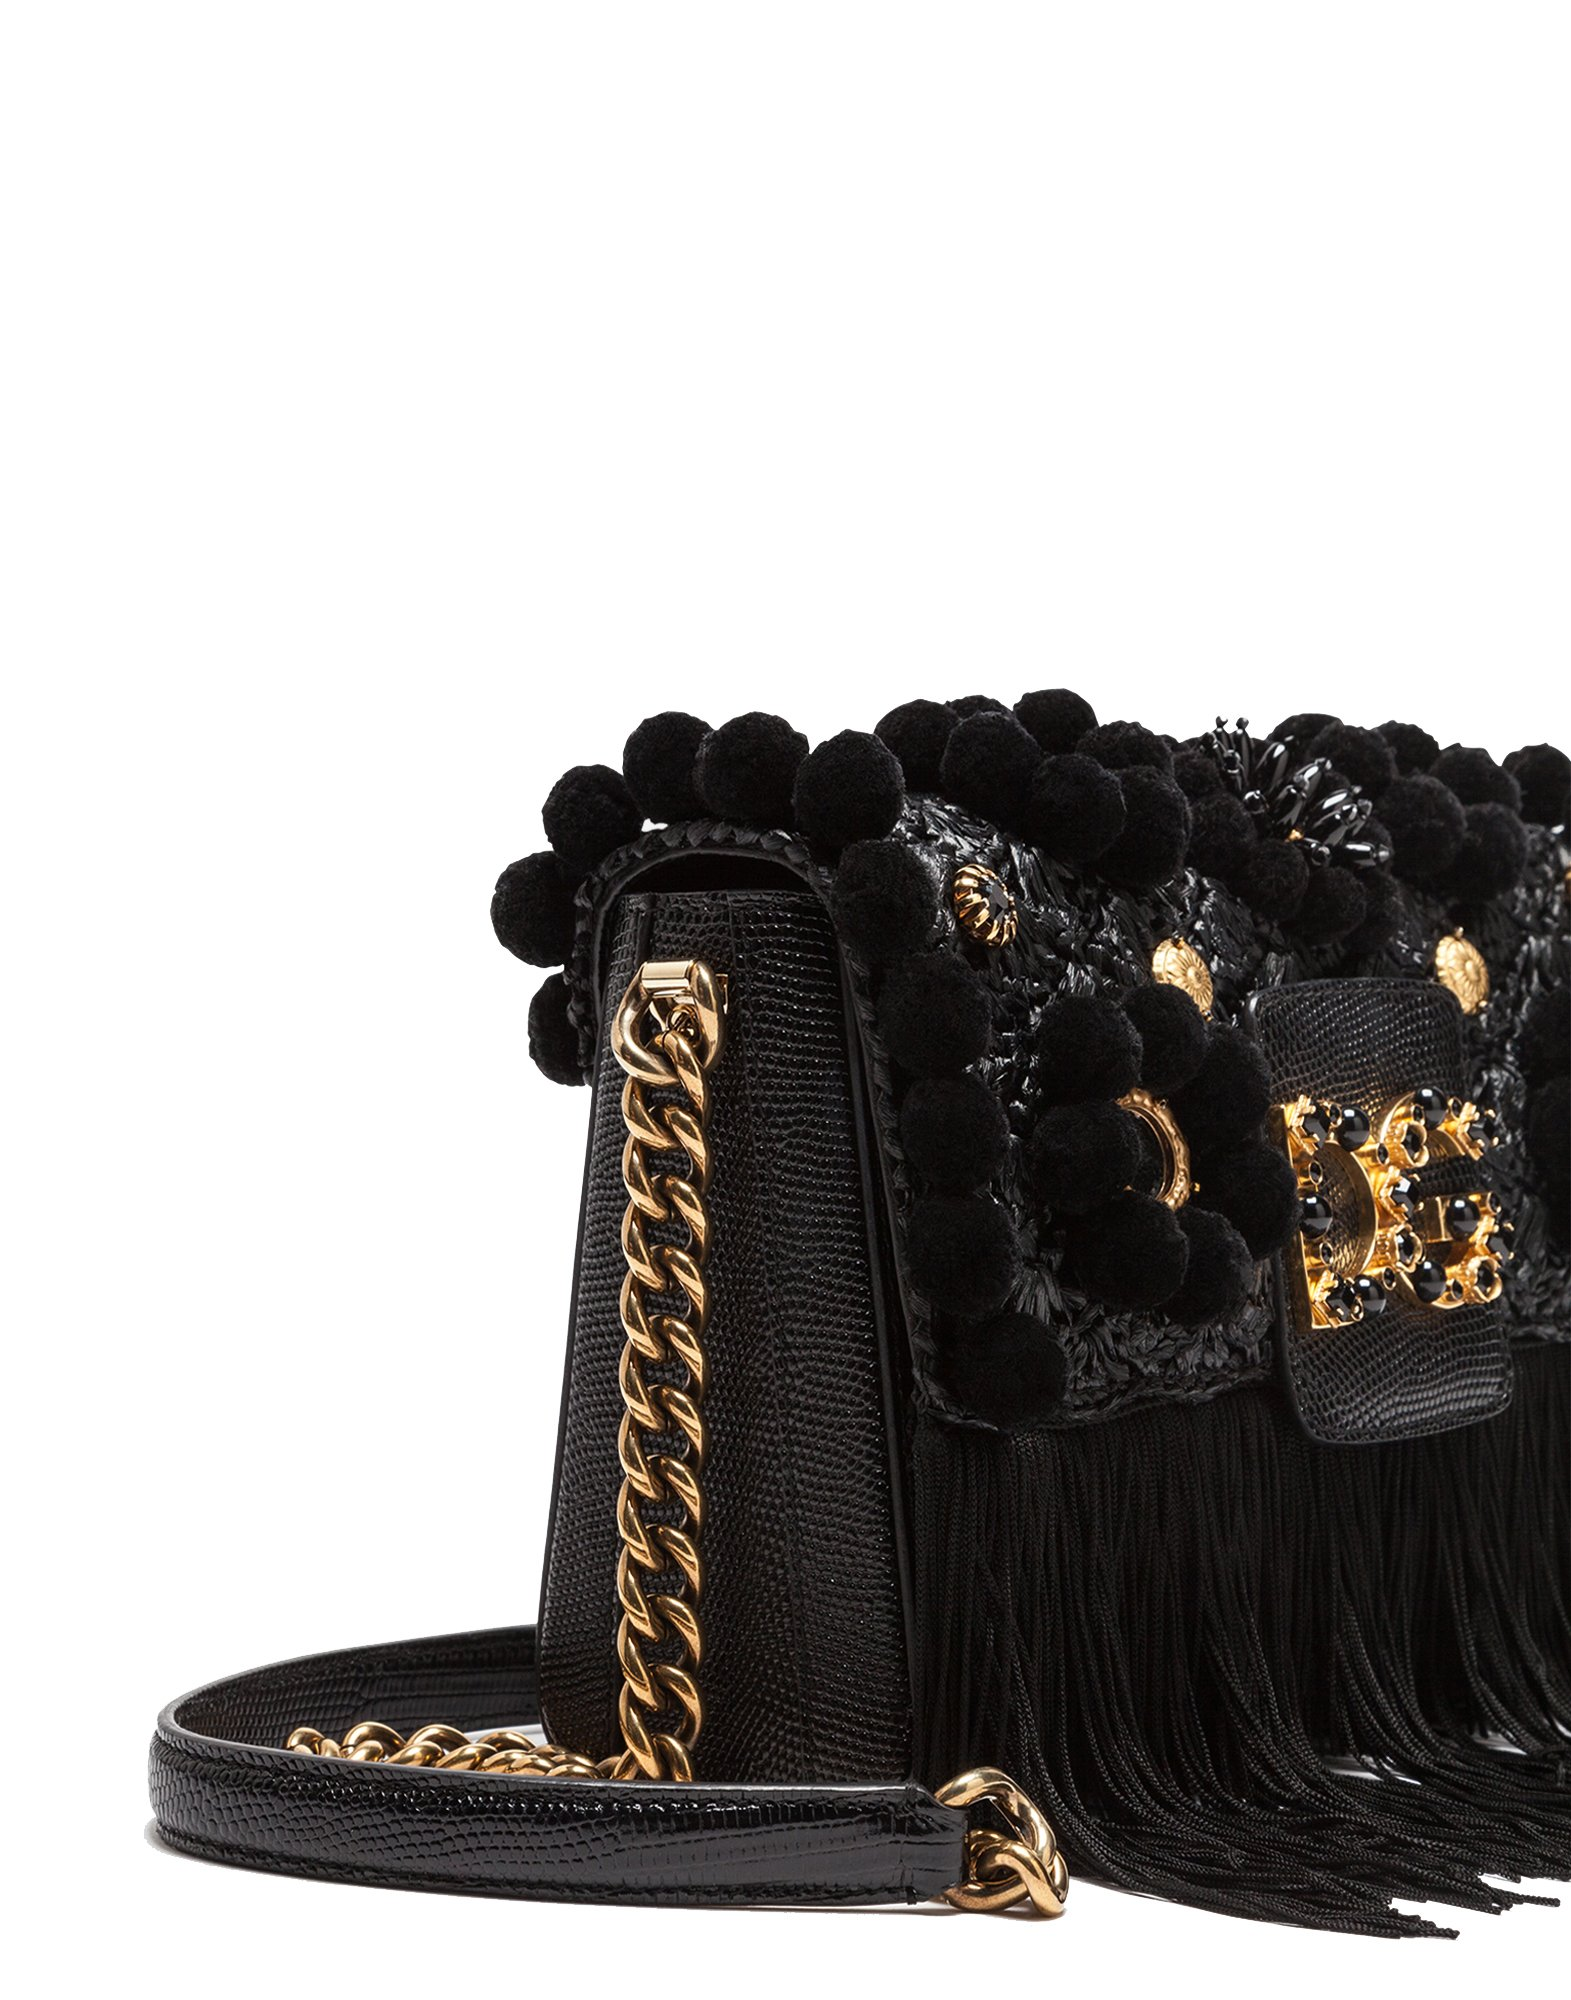 Dolce E Gabbana Women's Bb6393as9038b956 Black Leather Shoulder Bag by Dolce e Gabbana (Image #2)